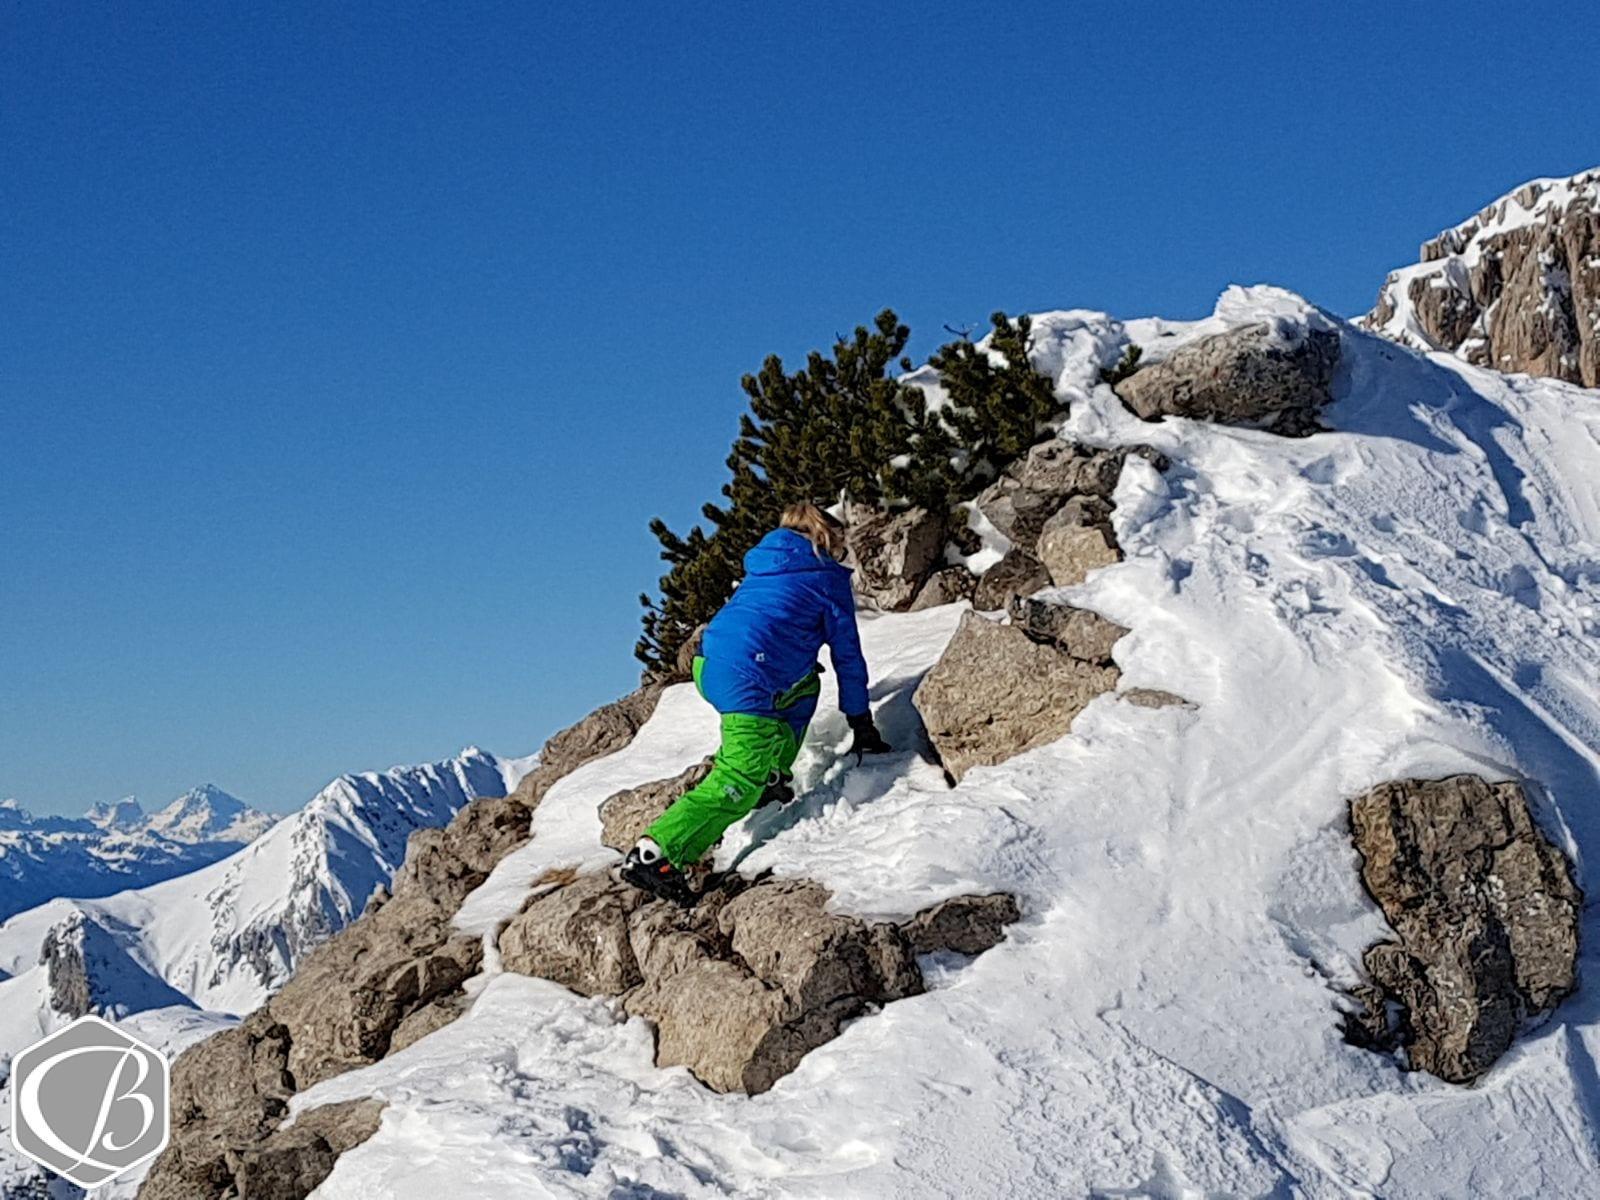 Klettermaxi Nassfeld Ski Skifahren Berg Winter